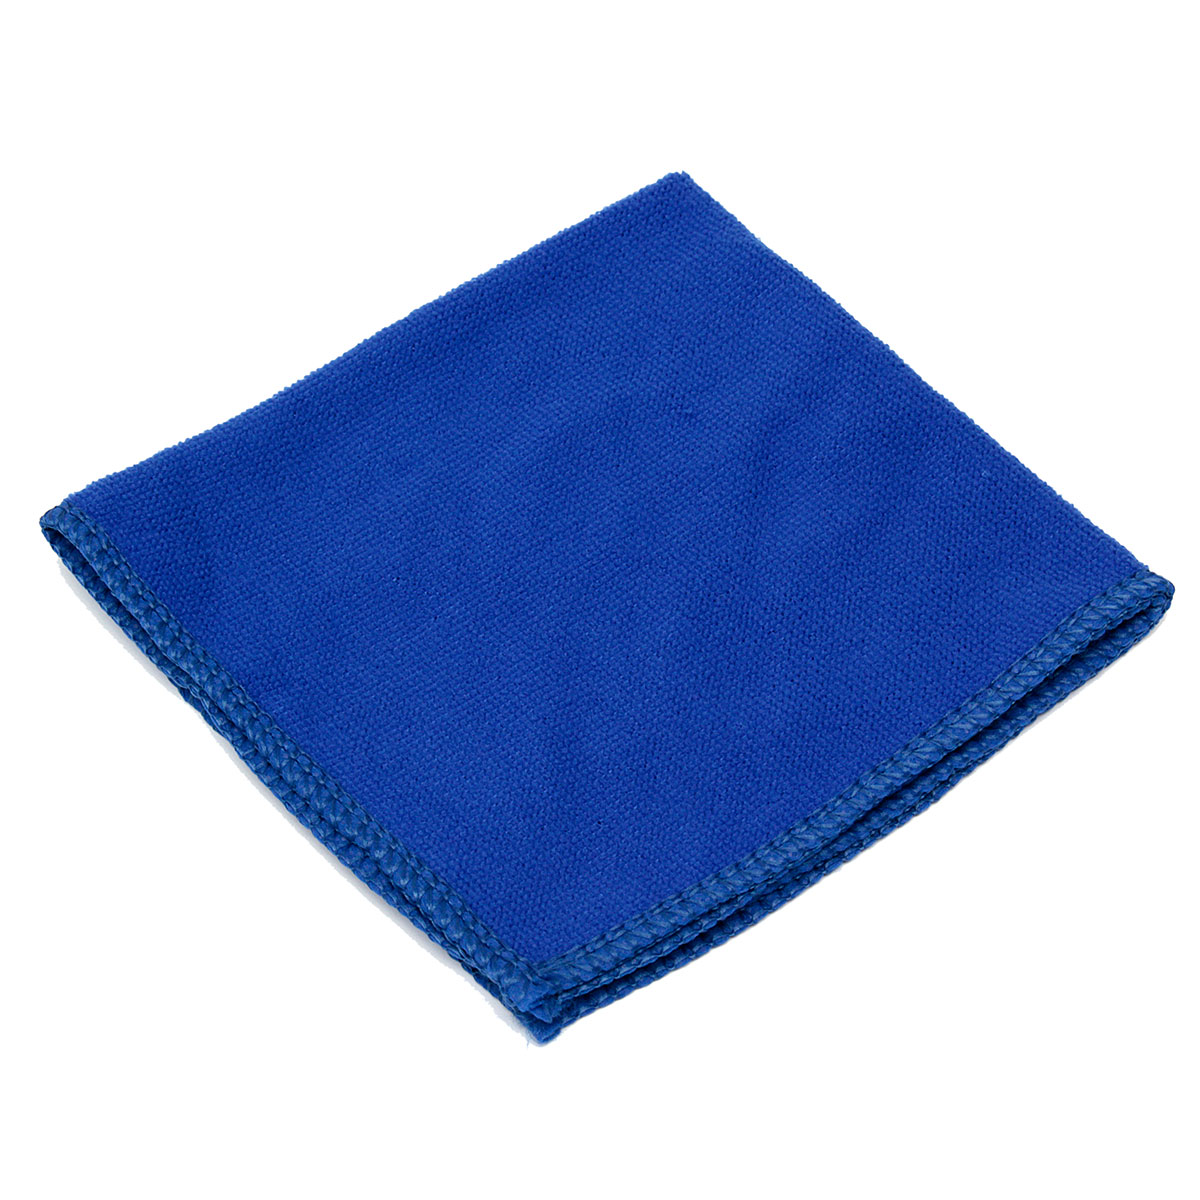 microfiber car care towel 30 x 30 cm blue lazada malaysia. Black Bedroom Furniture Sets. Home Design Ideas